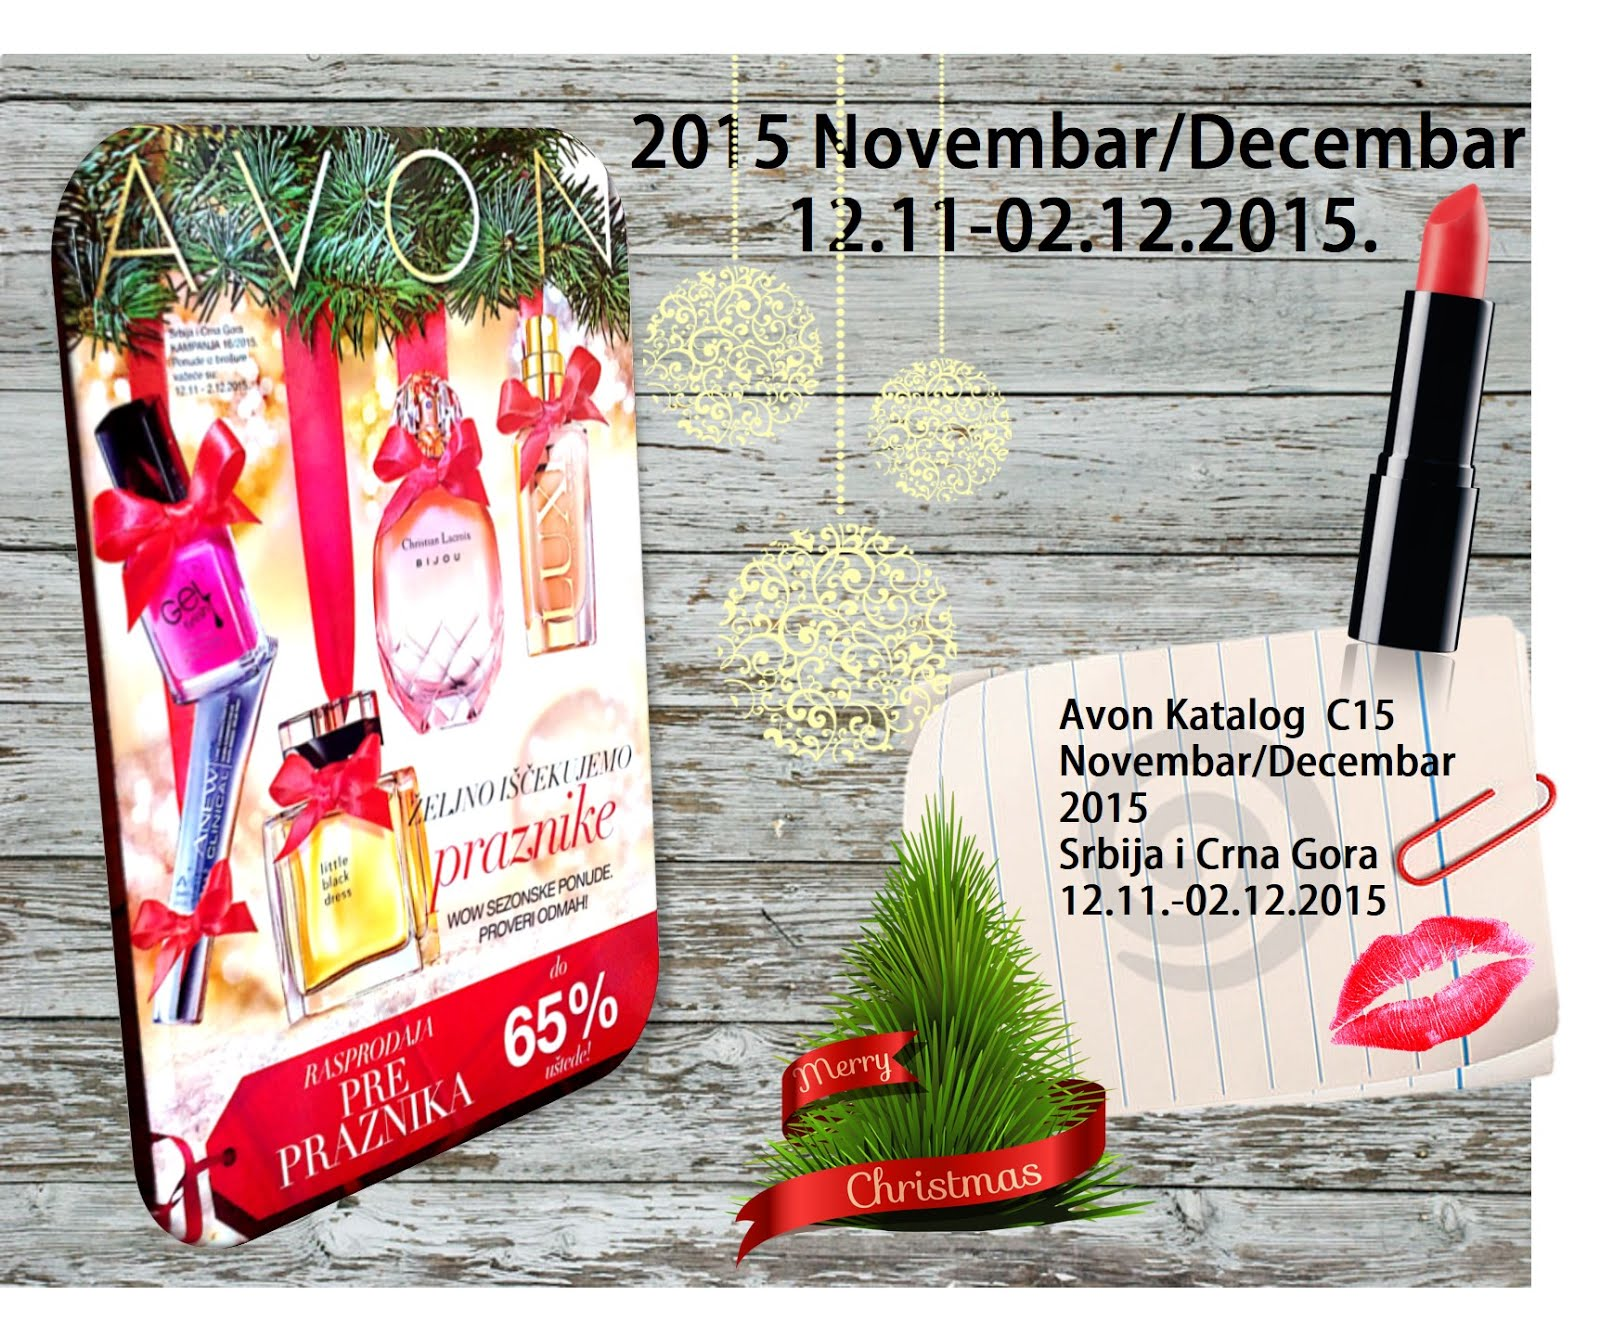 Avon Katalog  C15 Novembar/Decembar 2015 Srbija i Crna Gora 12.11.-02.12.2015